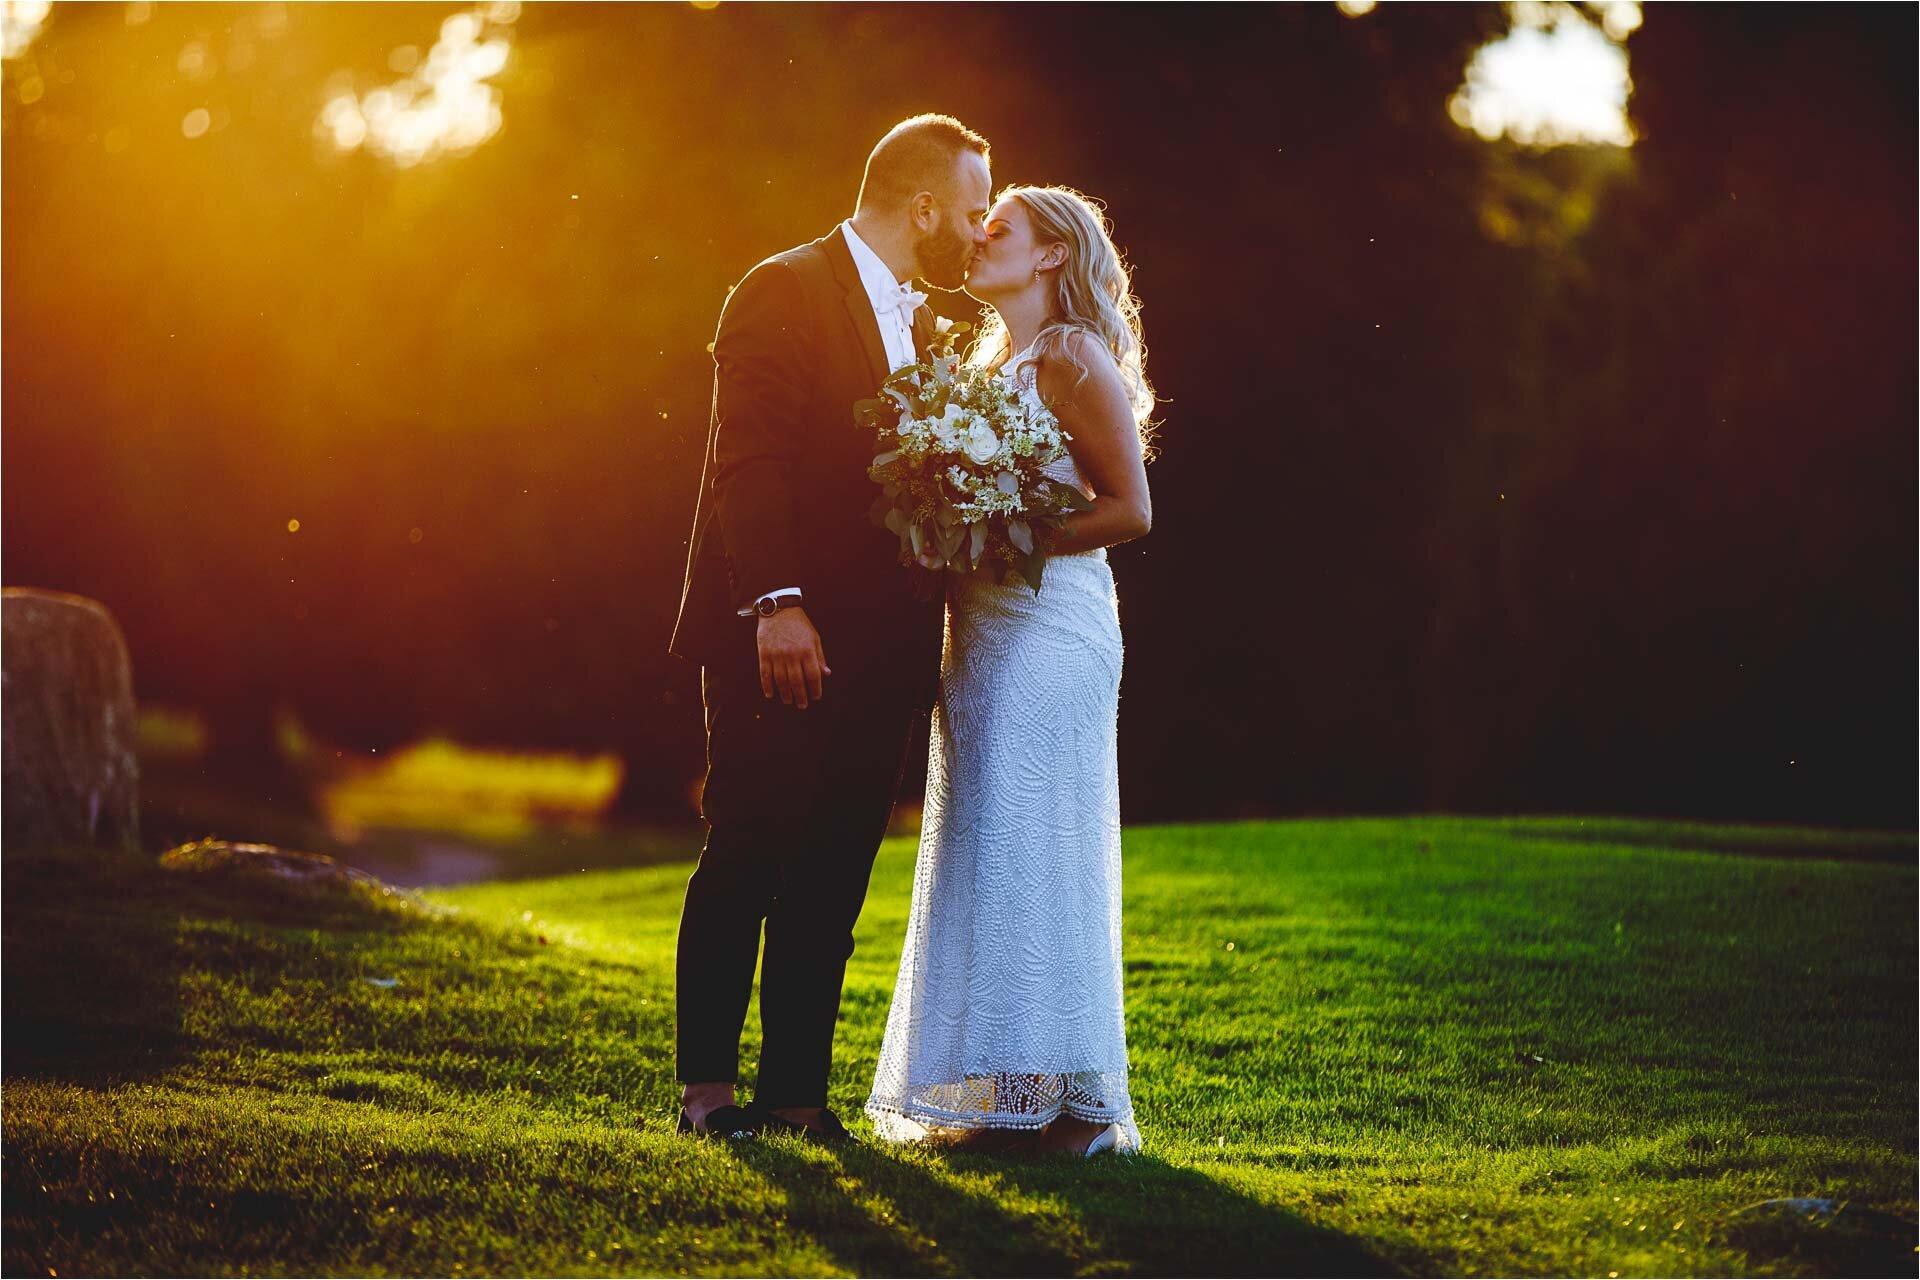 racebrook-countryclub-wedding-photography-23.jpg